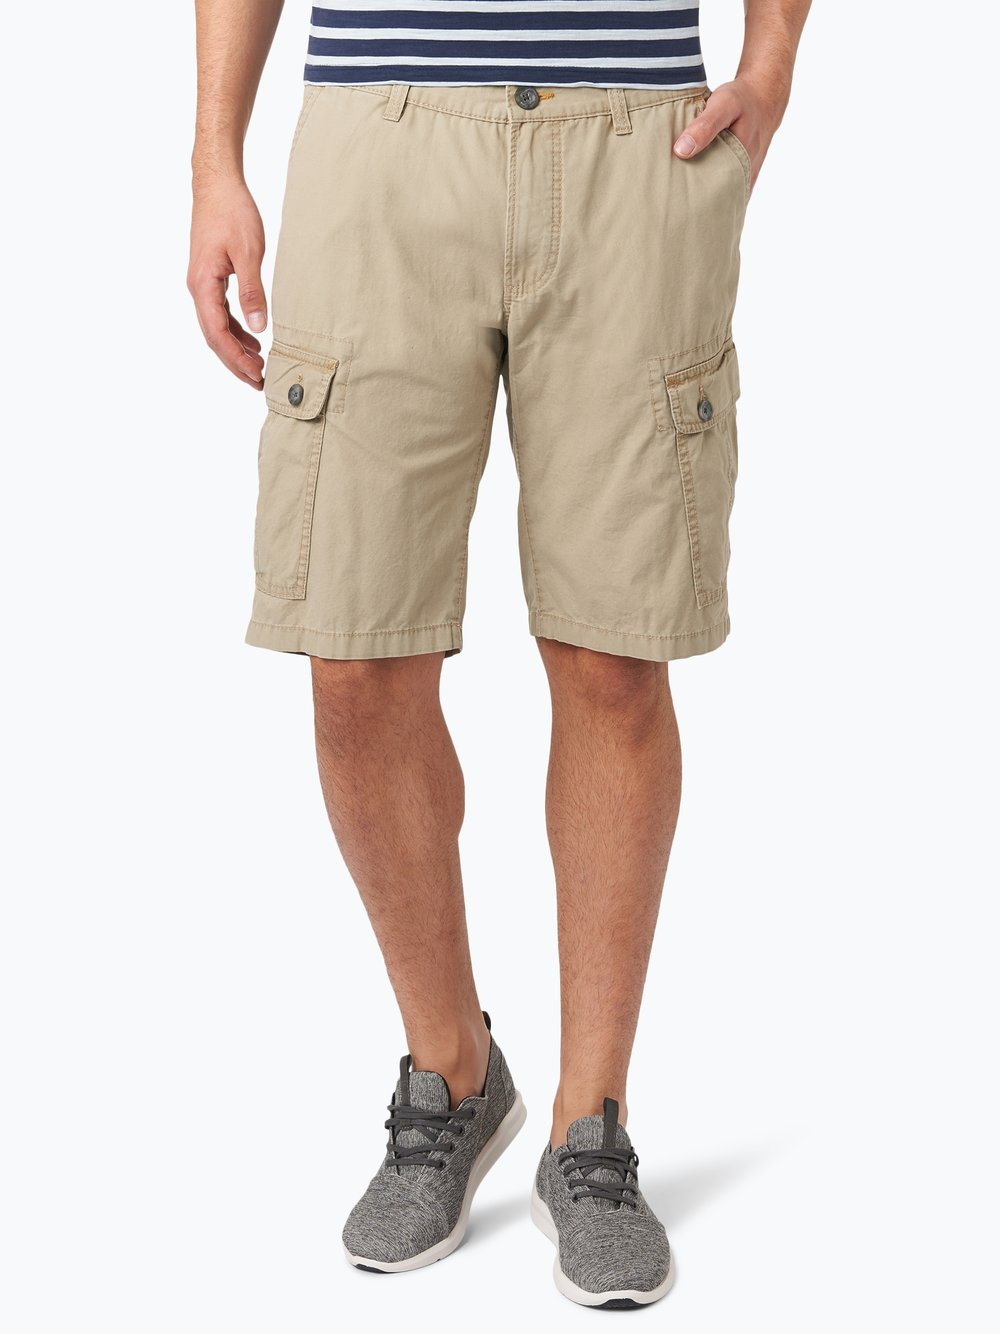 Camel Active Herren Shorts Houston online kaufen   PEEK